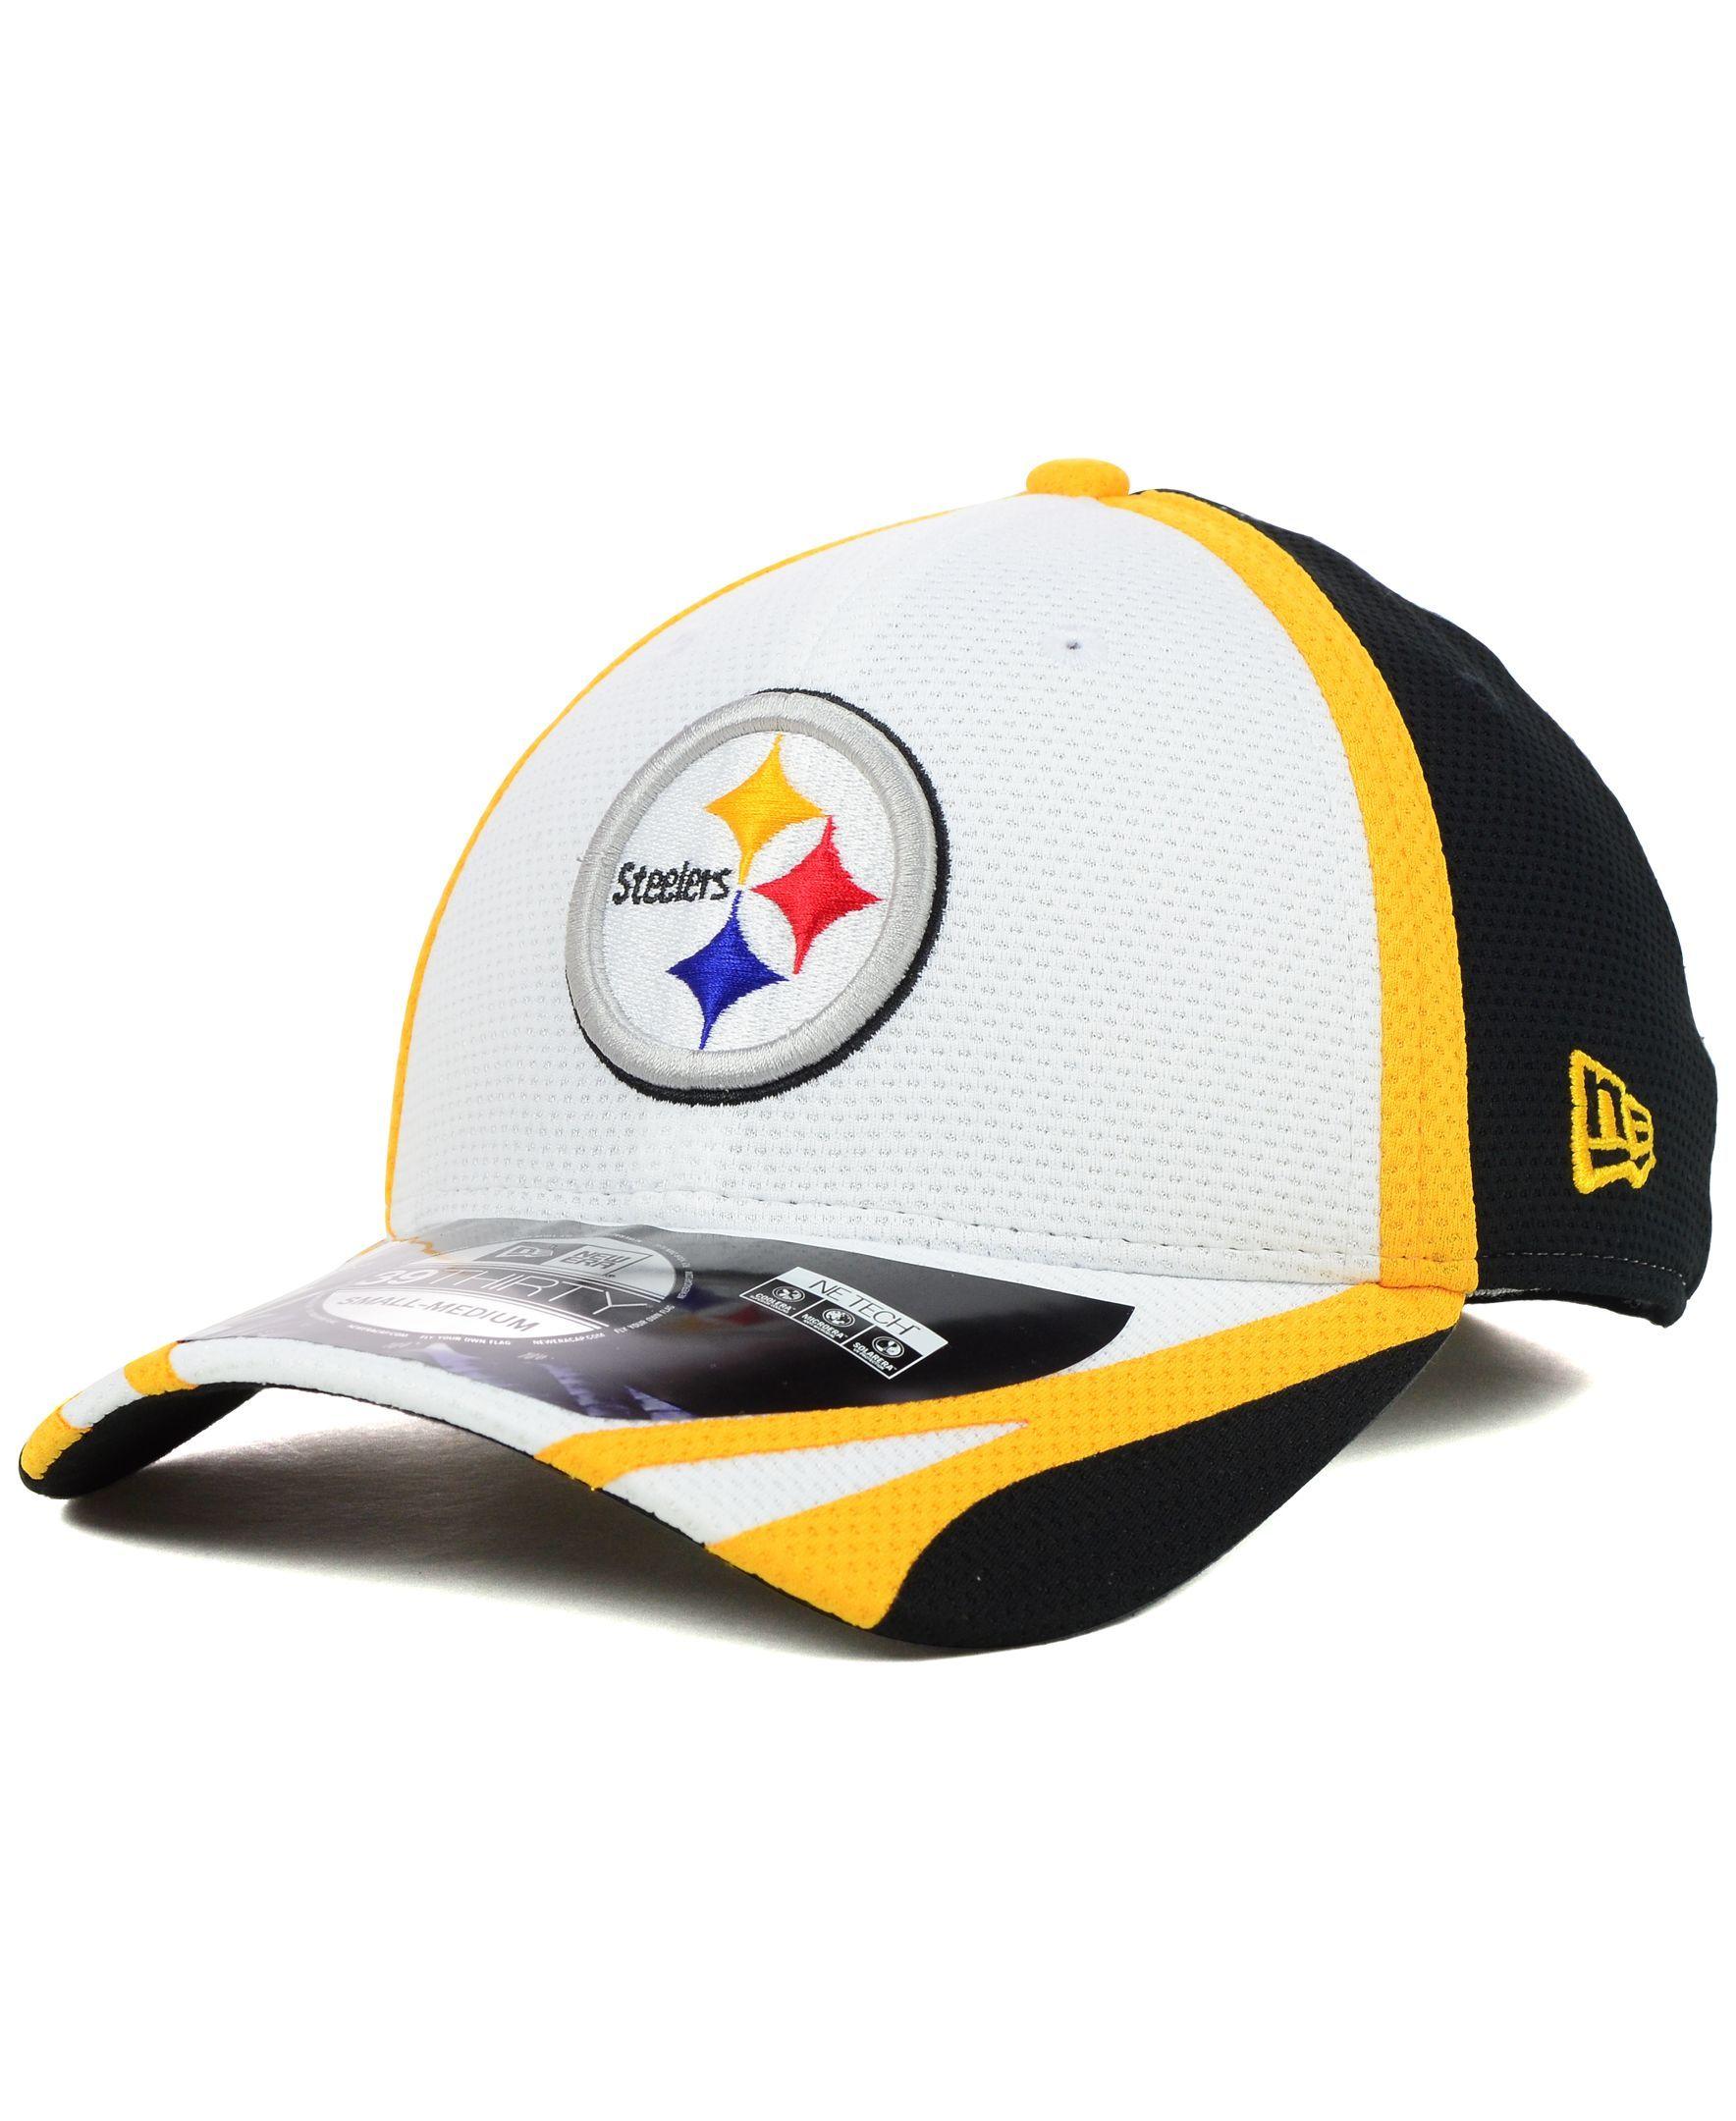 New Era Pittsburgh Steelers Nfl 2014 Training Camp 39THIRTY Cap ... 6cd2e3905e1a